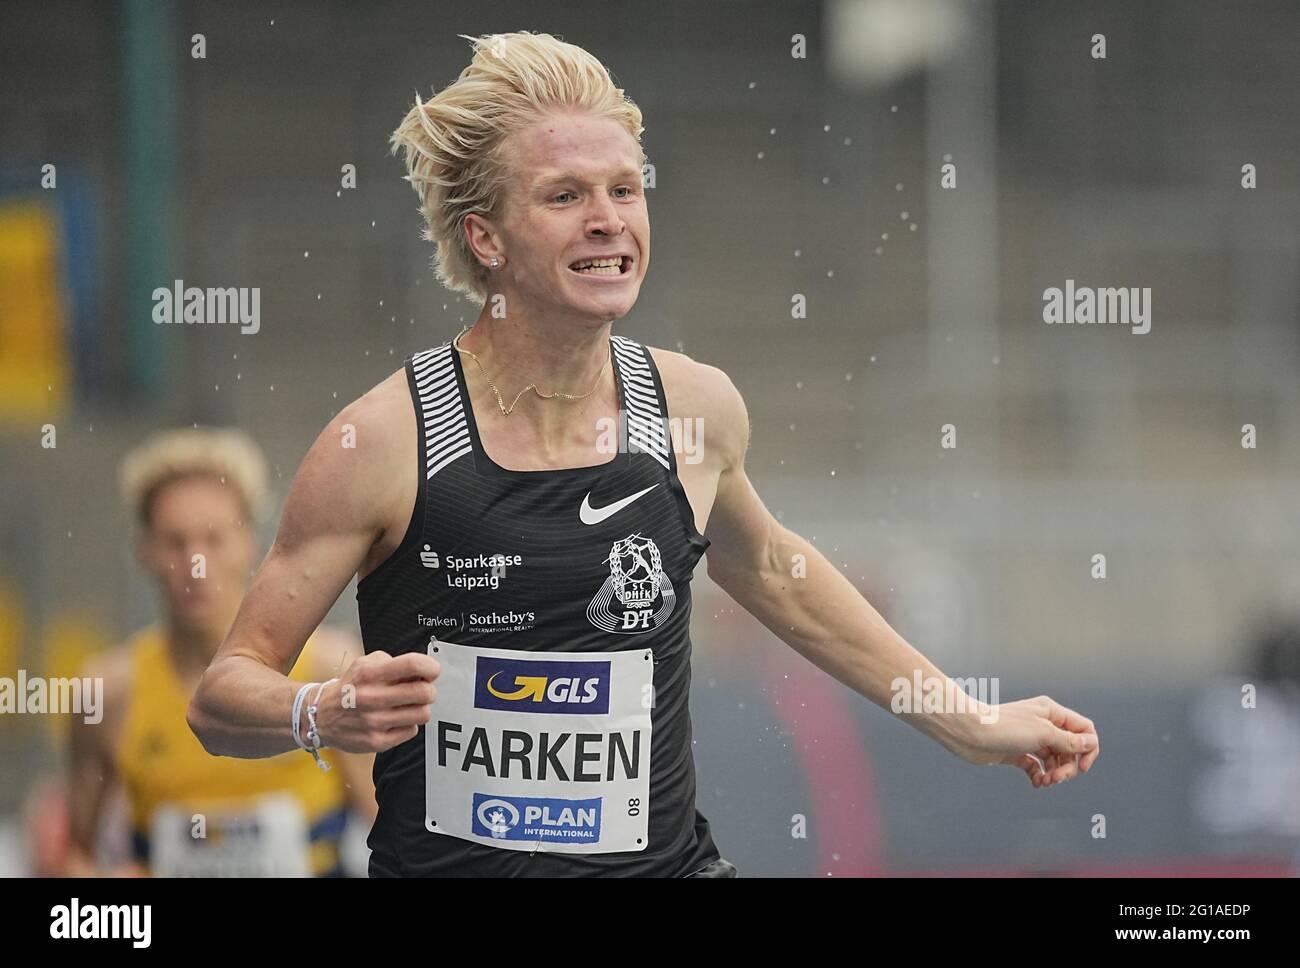 brunswick-germany-06th-june-2021-athletics-german-championships-1500m-men-robert-farken-in-action-credit-michael-kappelerdpaalamy-live-news-2G1AEDP.jpg